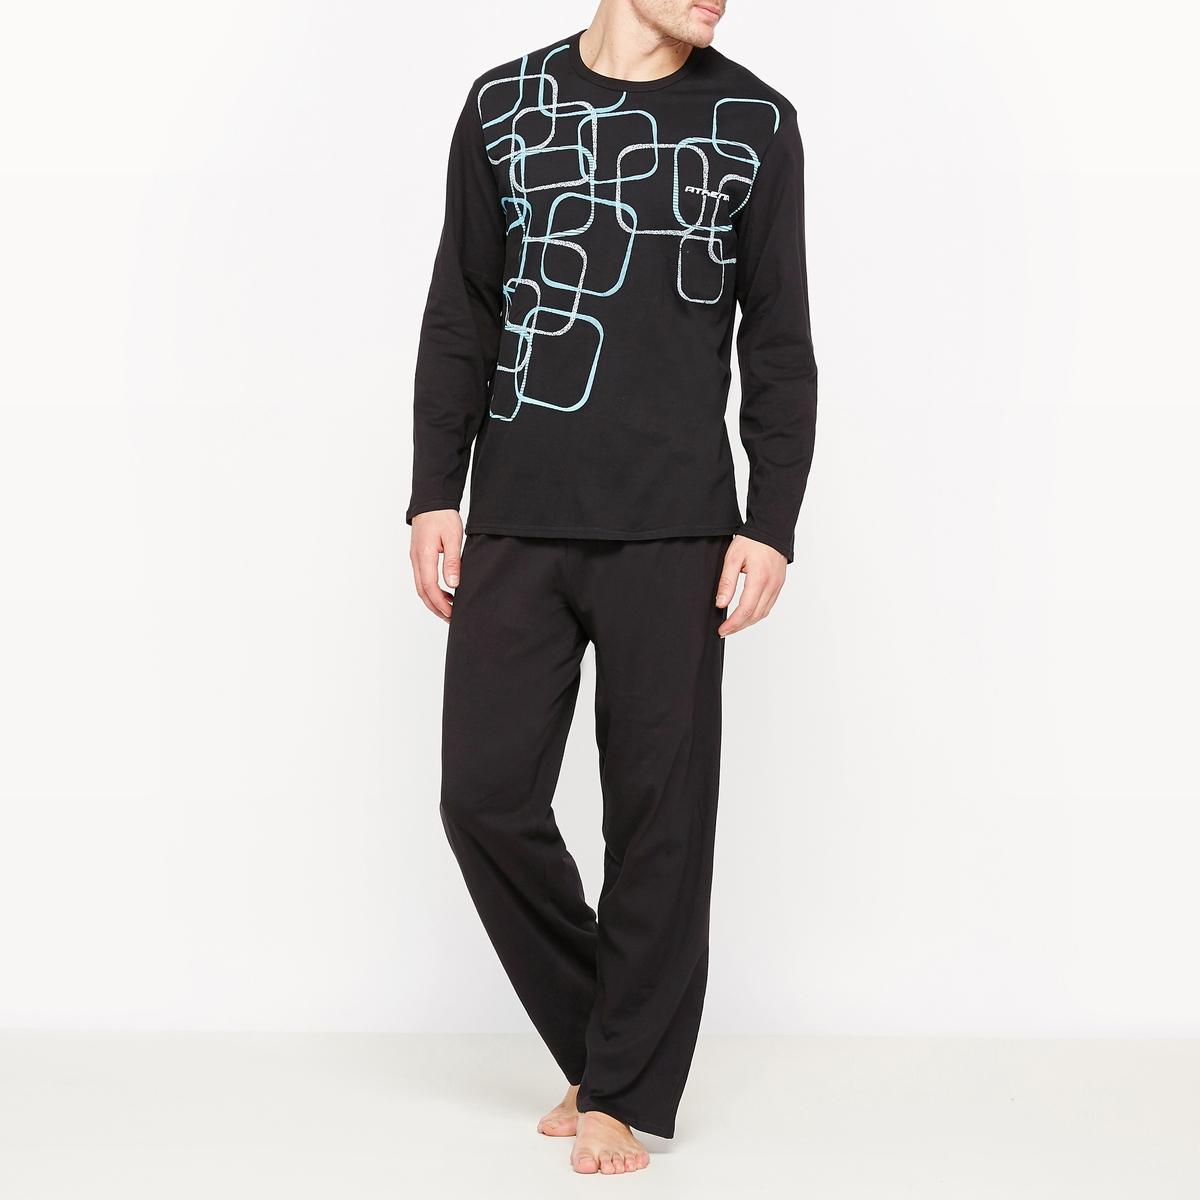 Пижама из джерси, 100% хлопок